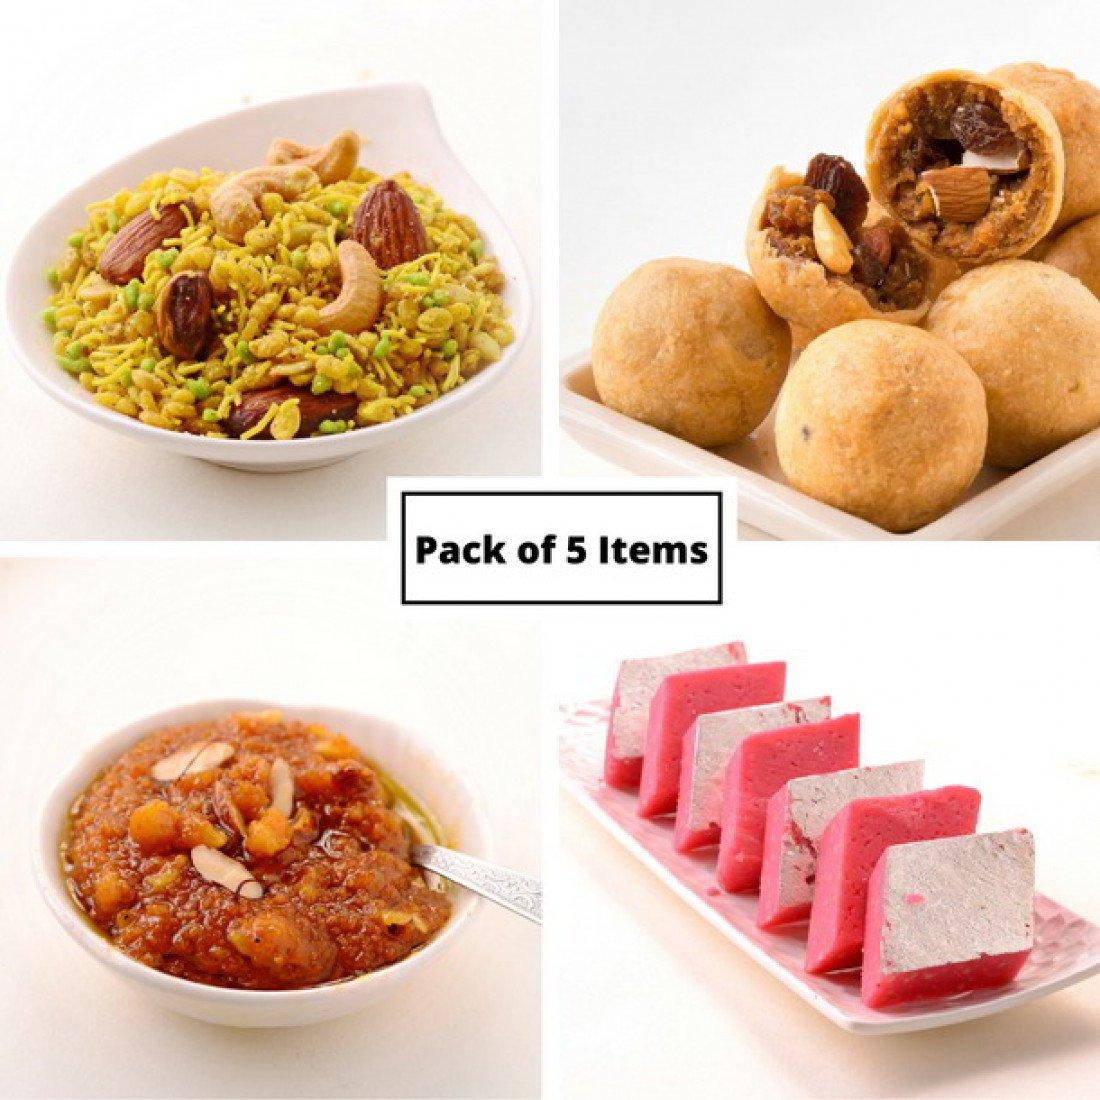 Kandoi Sweets (Ahmedabad) Gujarati Indian Food Sweets and Snack Gift Basket